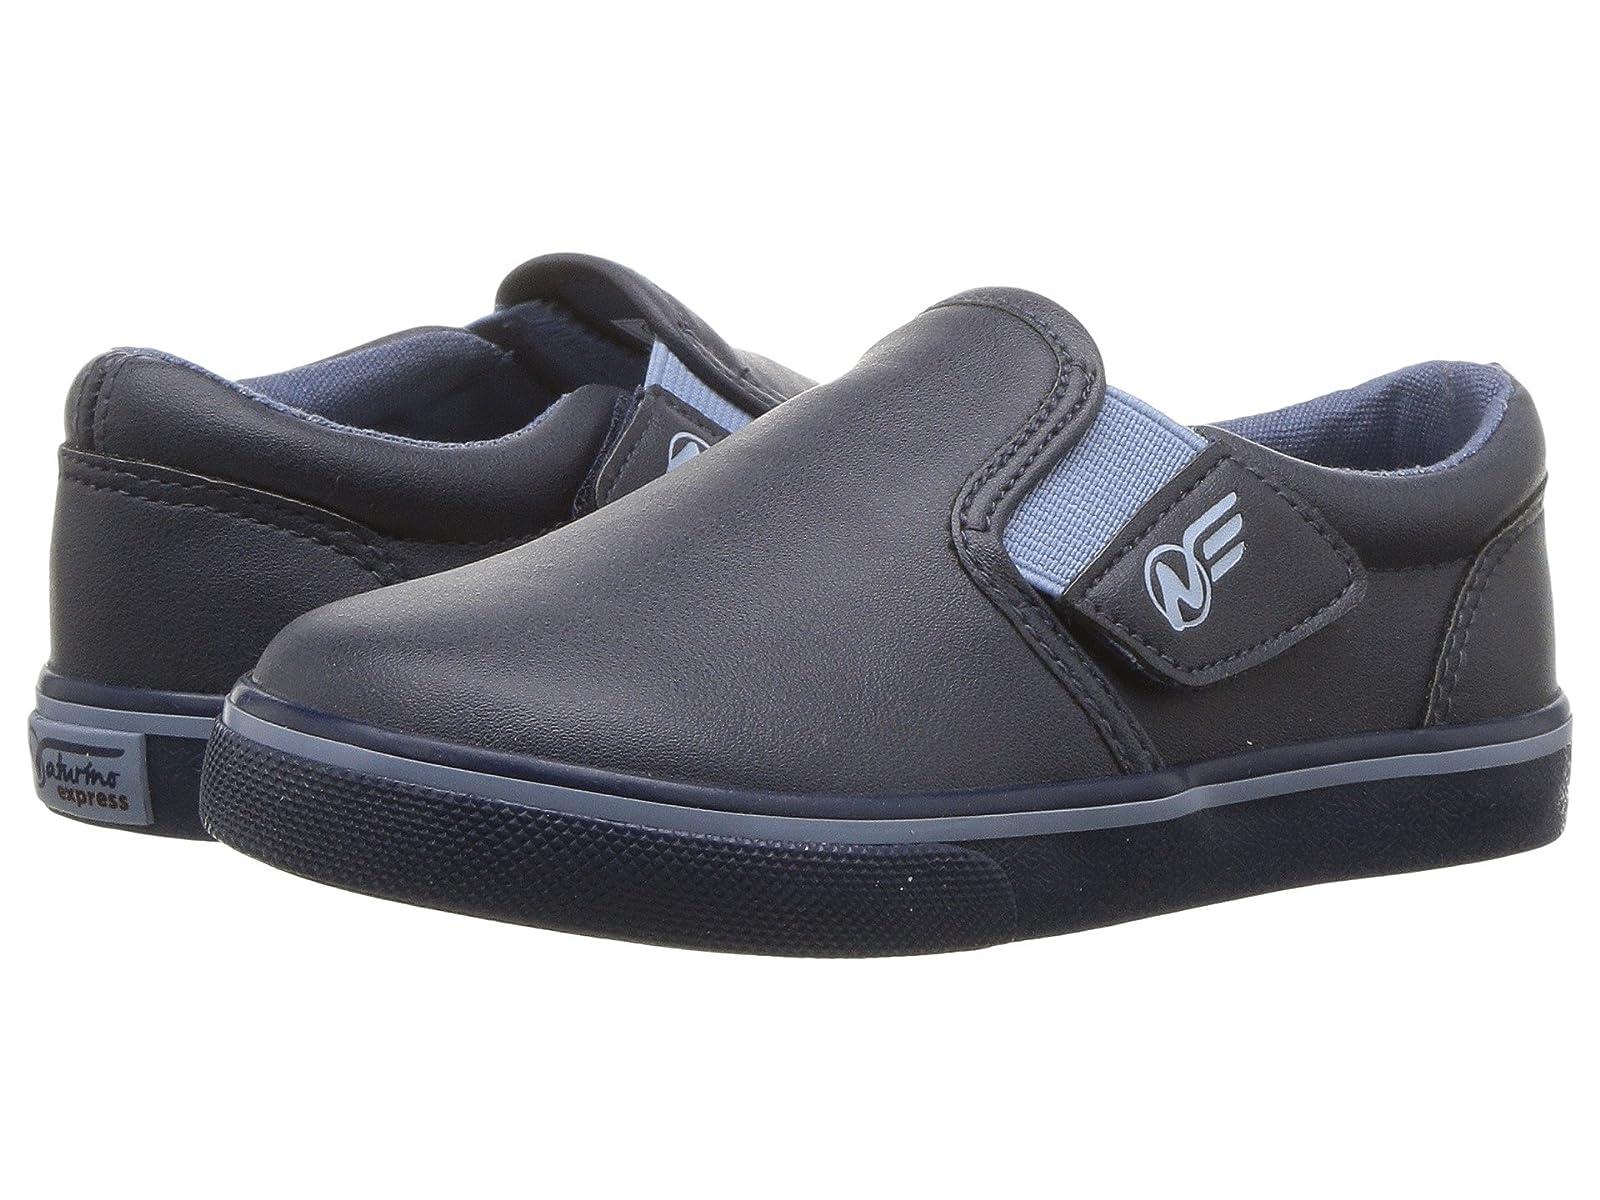 Naturino Express Neri (Toddler/Little Kid)Atmospheric grades have affordable shoes